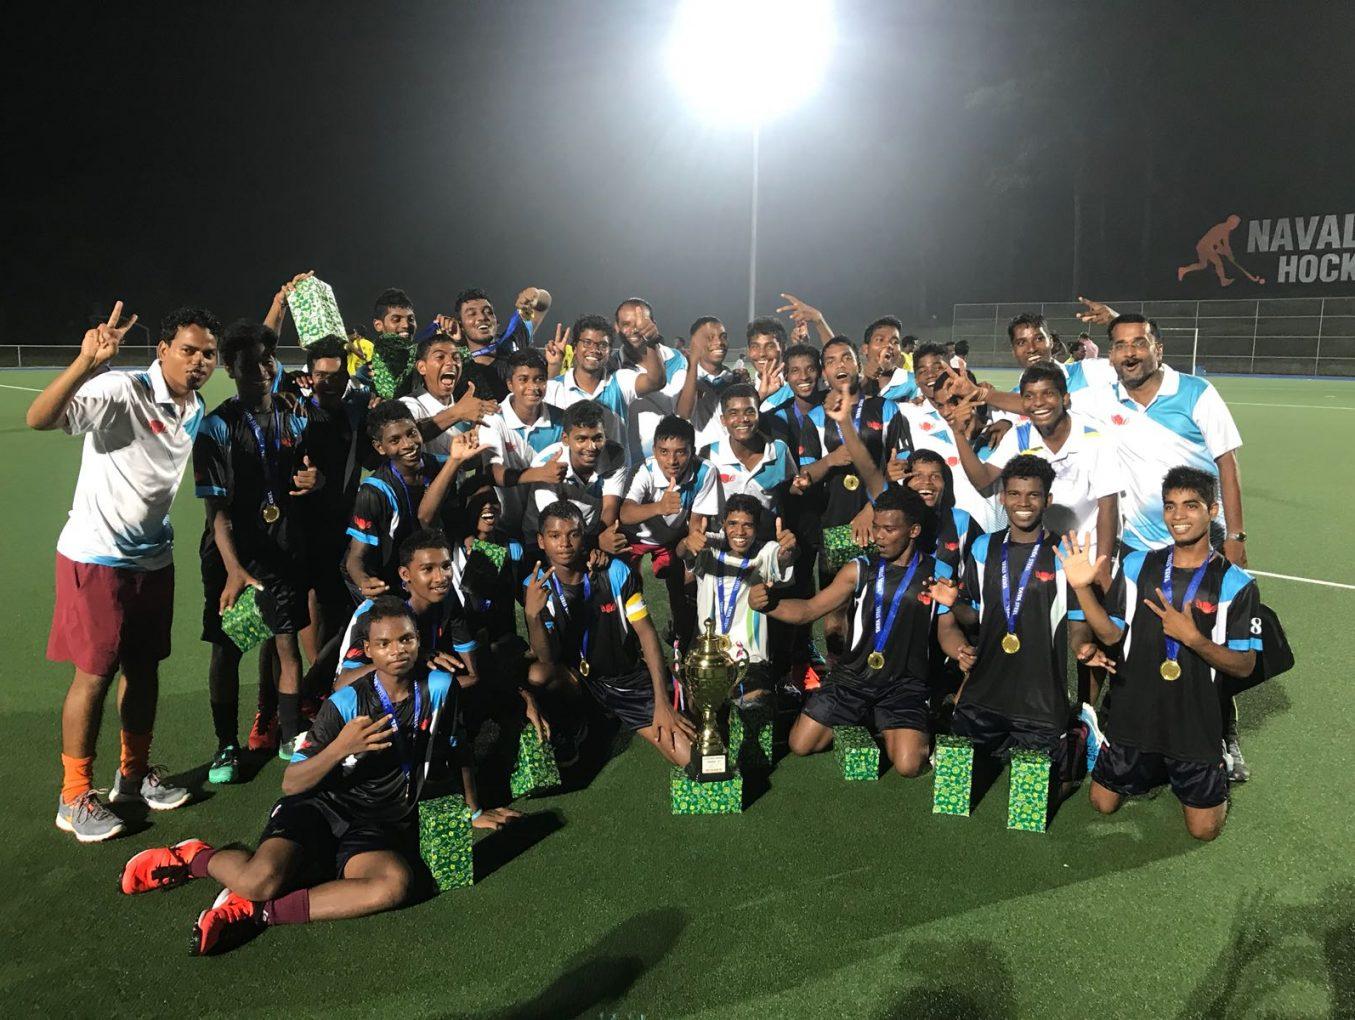 Naval Tata Hockey Academy boys win their first tournament